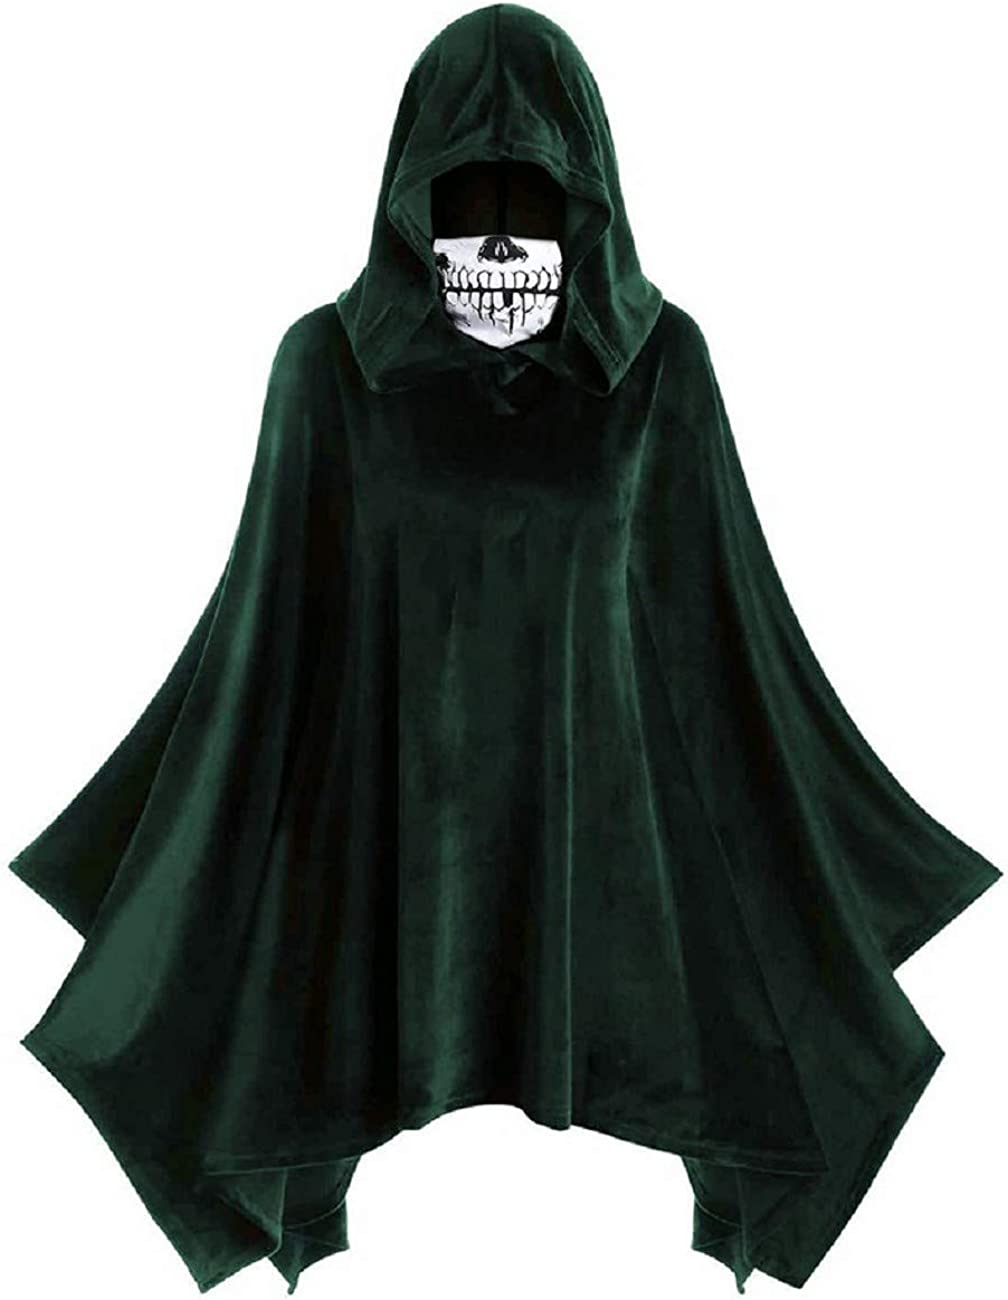 FAPIZI Womens Fashion Halloween Hooded Tops Funny Skull Mask Print Solid Color Vintage Irregular Cloak Cape Hoodies